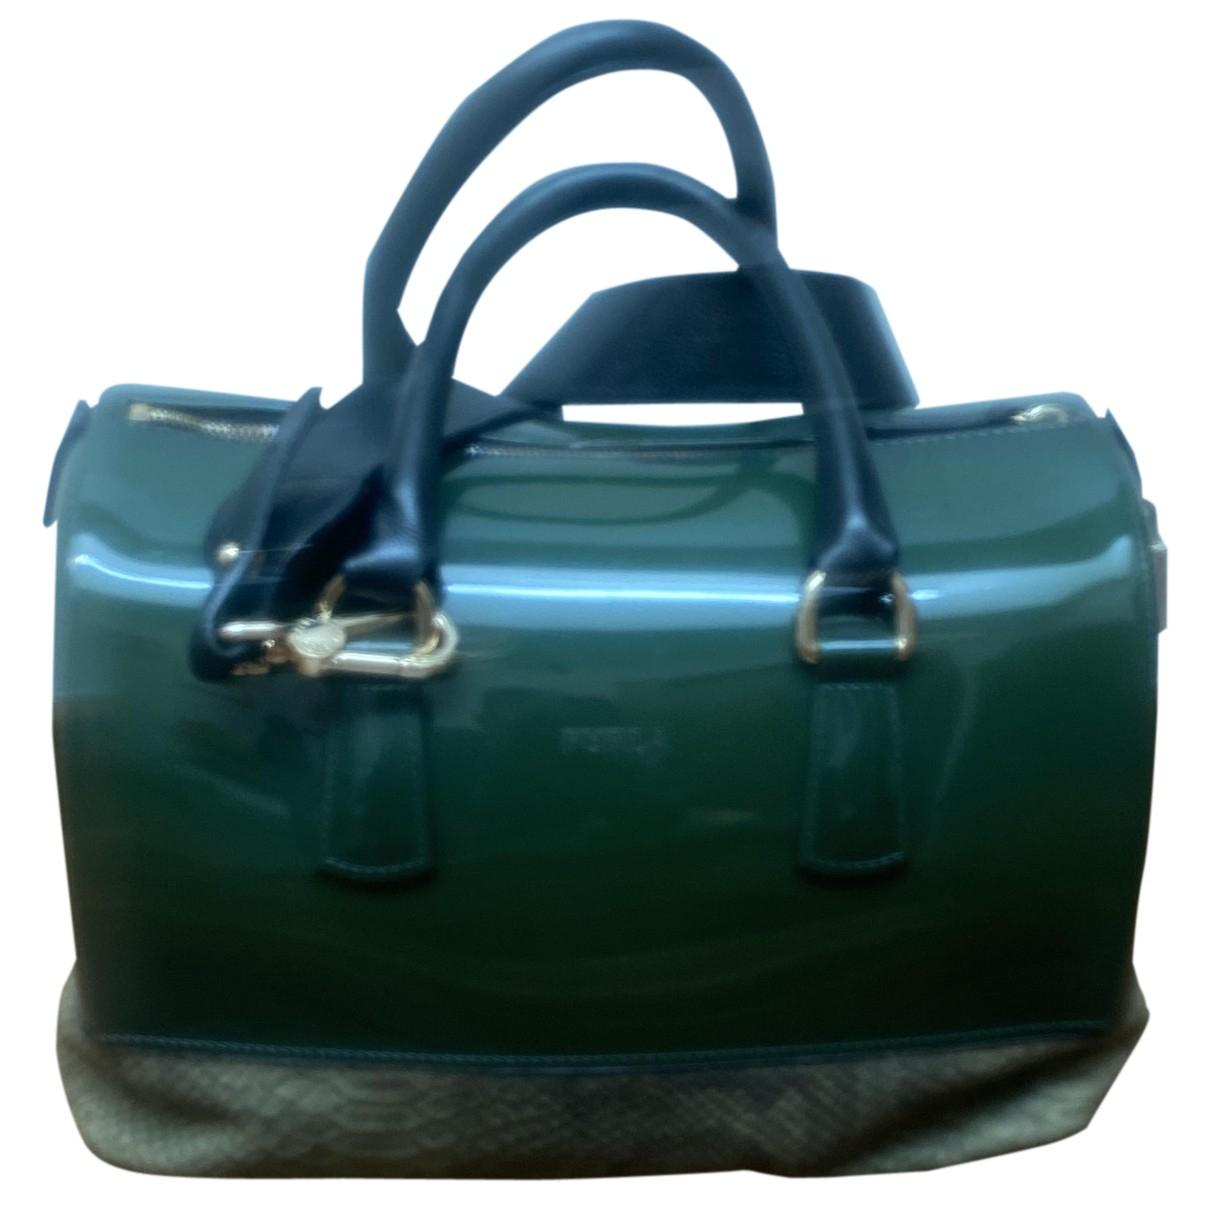 Furla Candy Bag Green Patent leather handbag for Women N